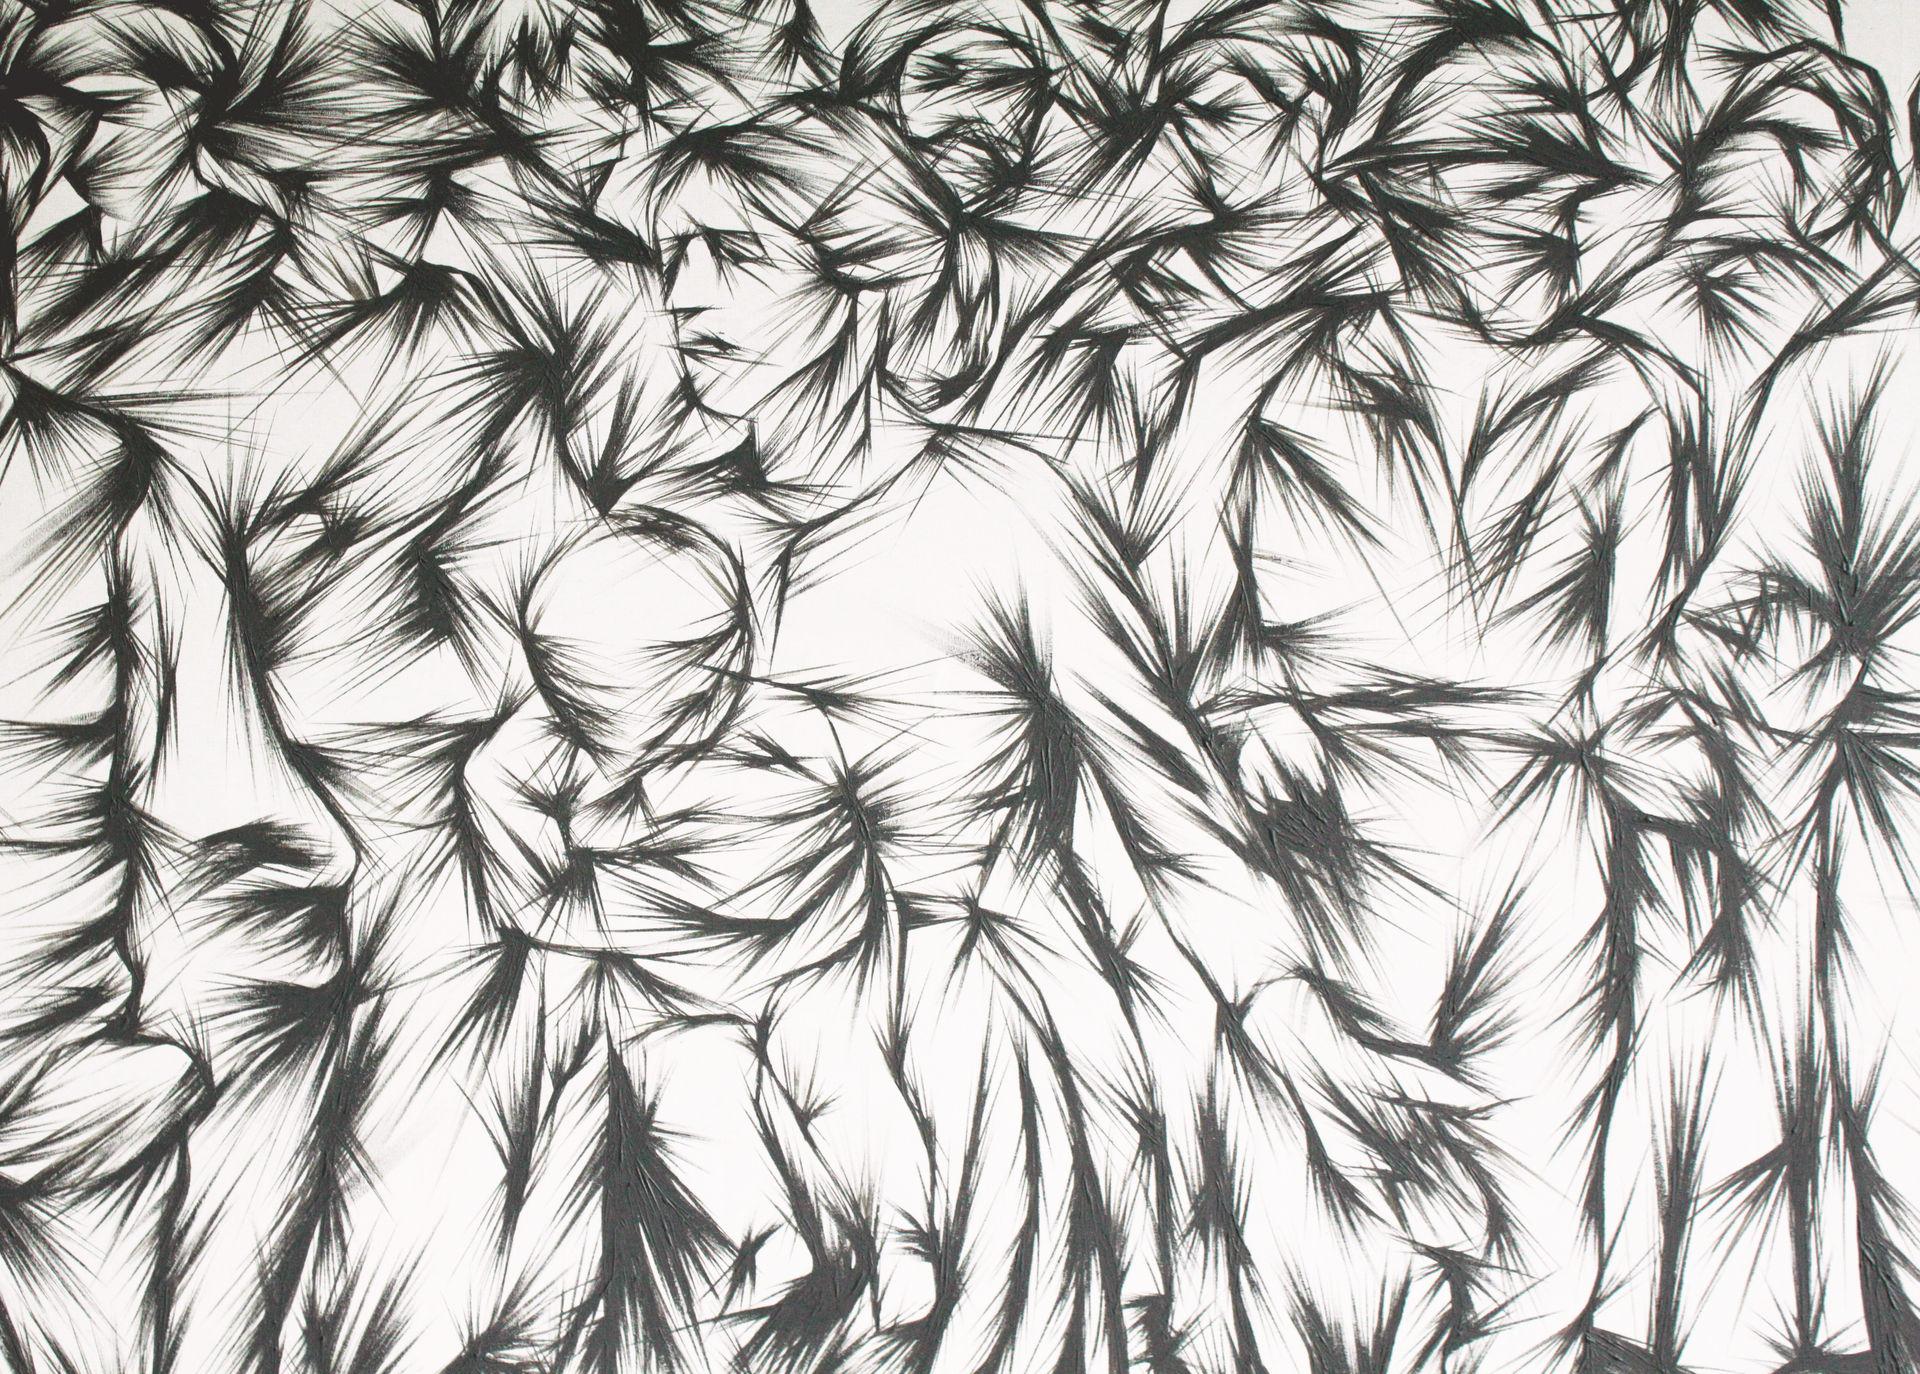 Tribute to Il Quarto Stato - detail